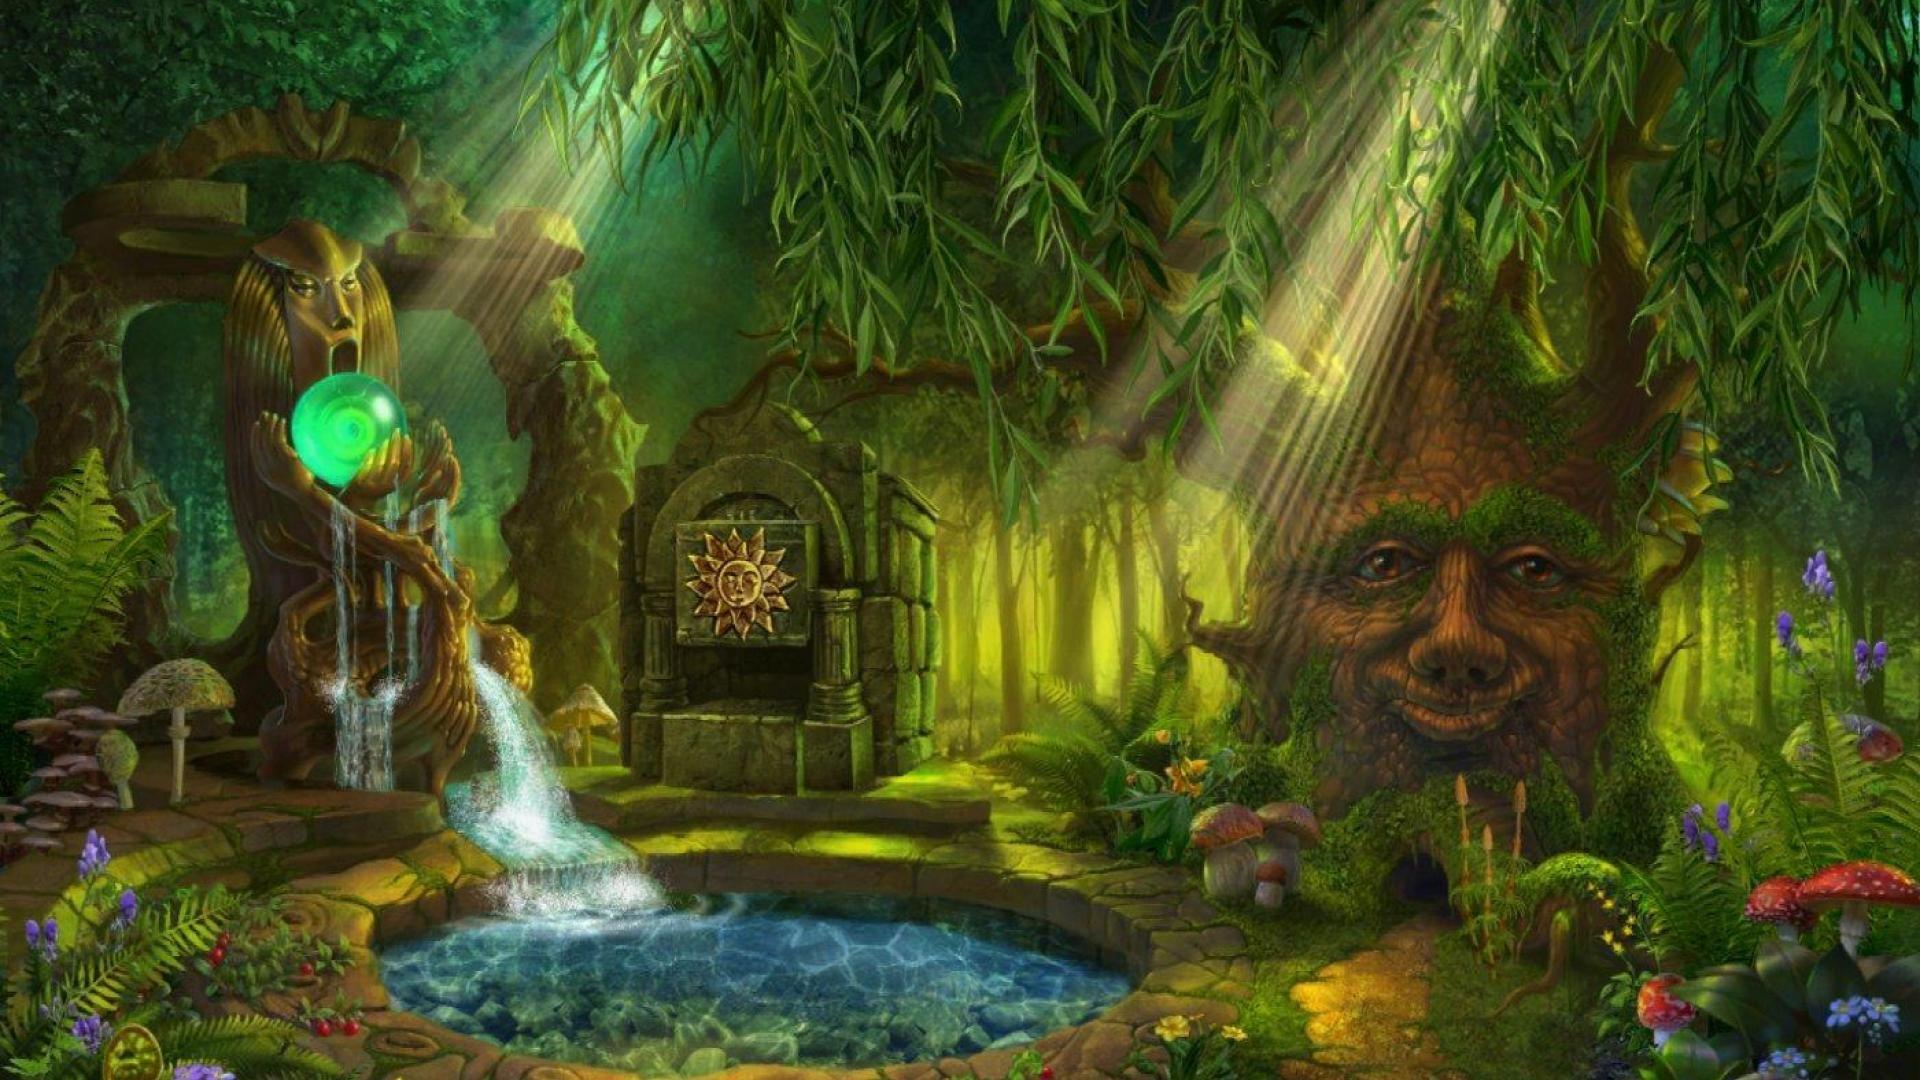 Fairy Garden Fantasy Landscape Fantasy Fantasy Forest